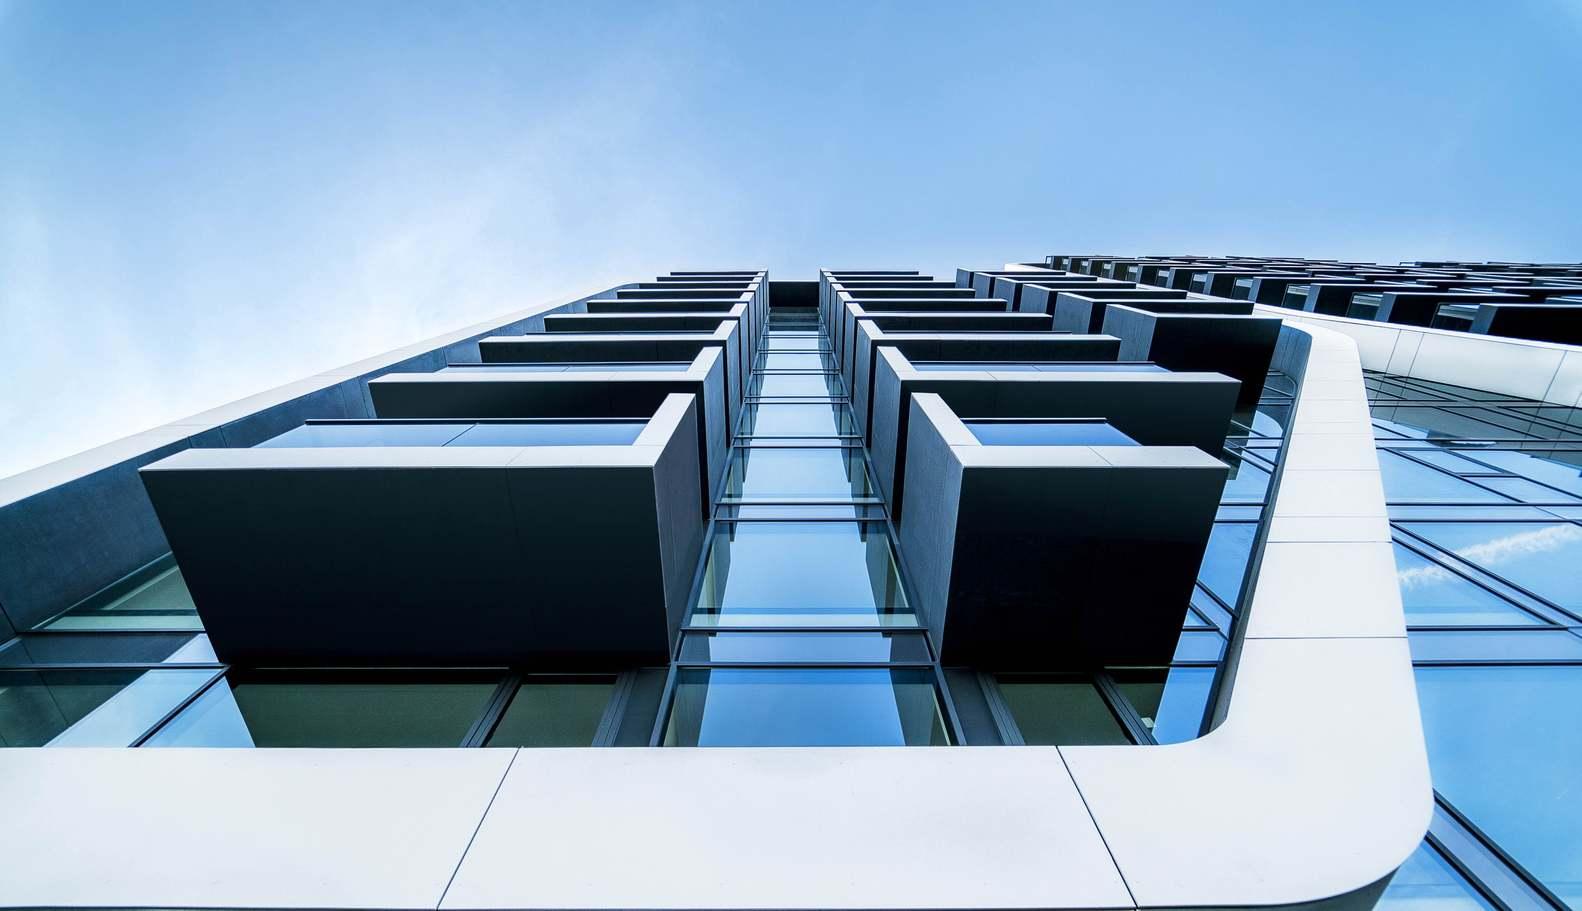 8_A3-Advanced Architecture Apartments _STARH_Inspirationist